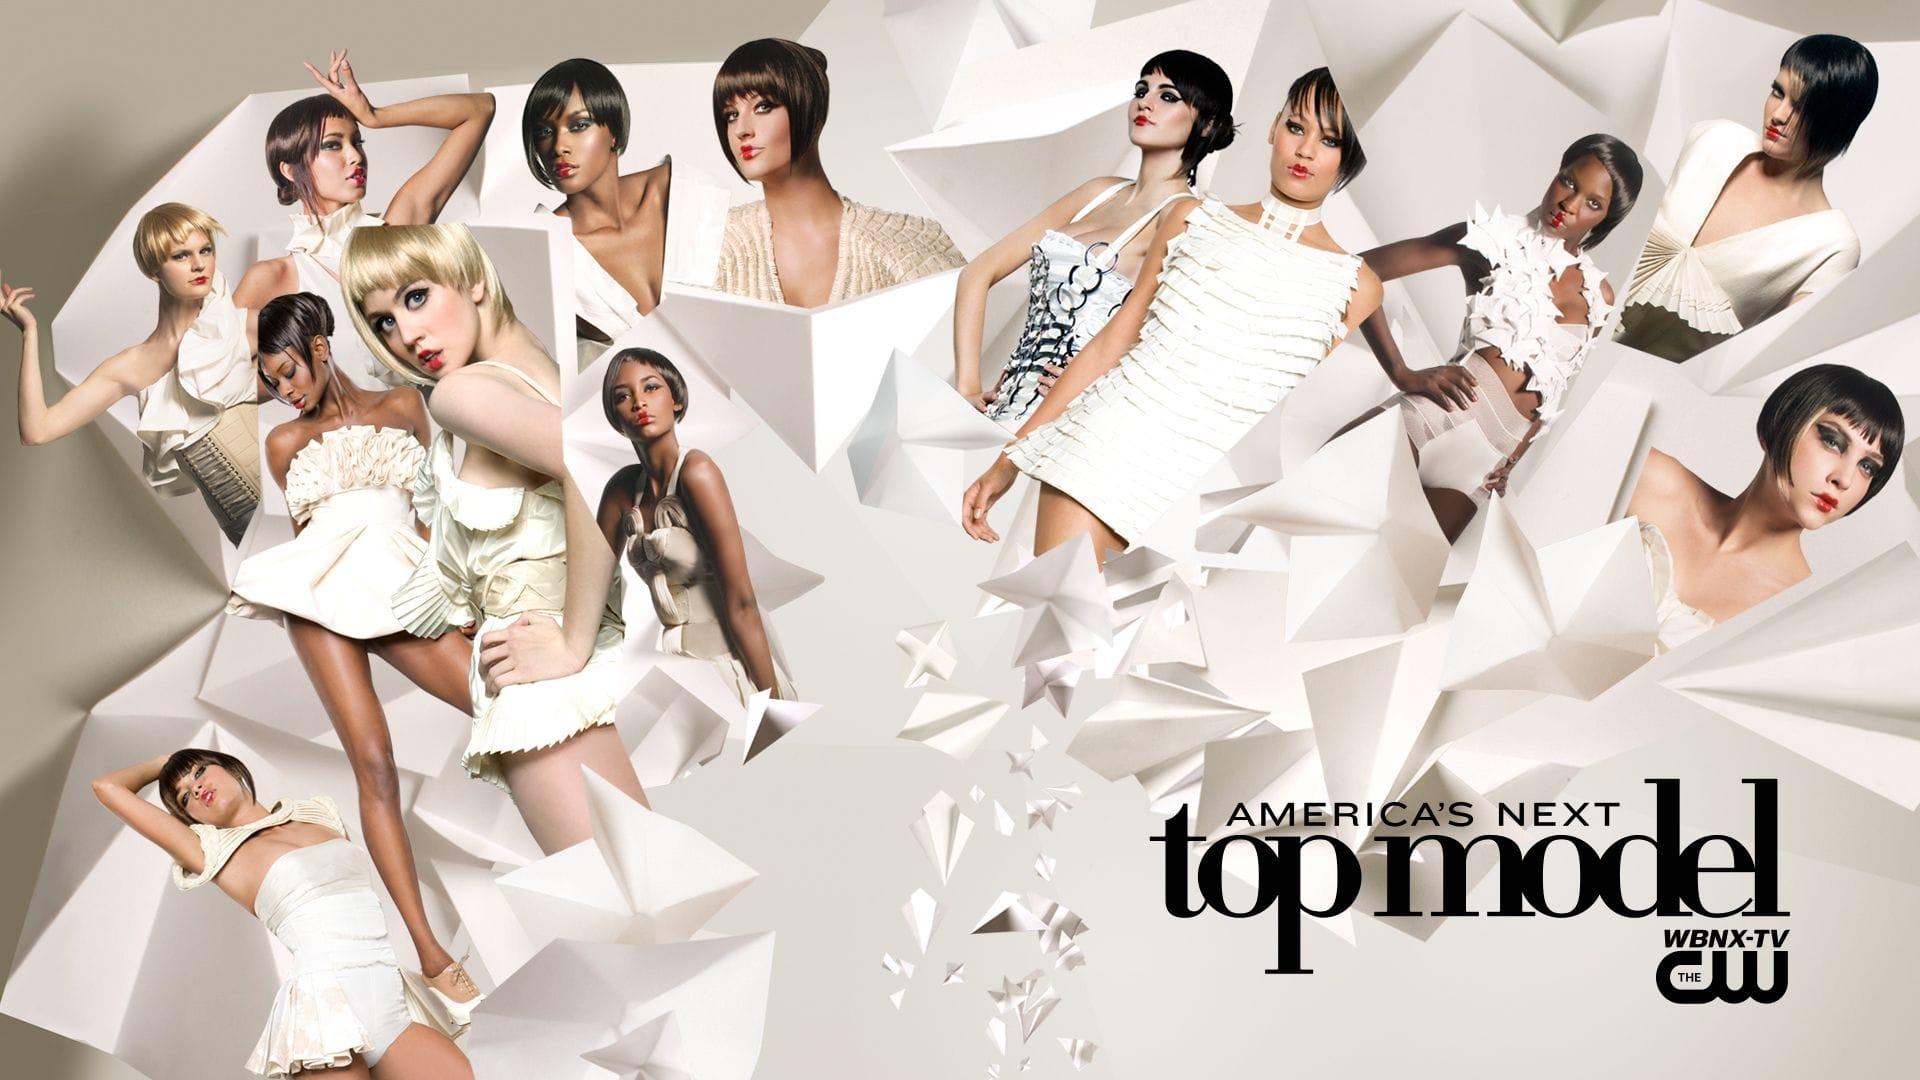 americas next top model season 25